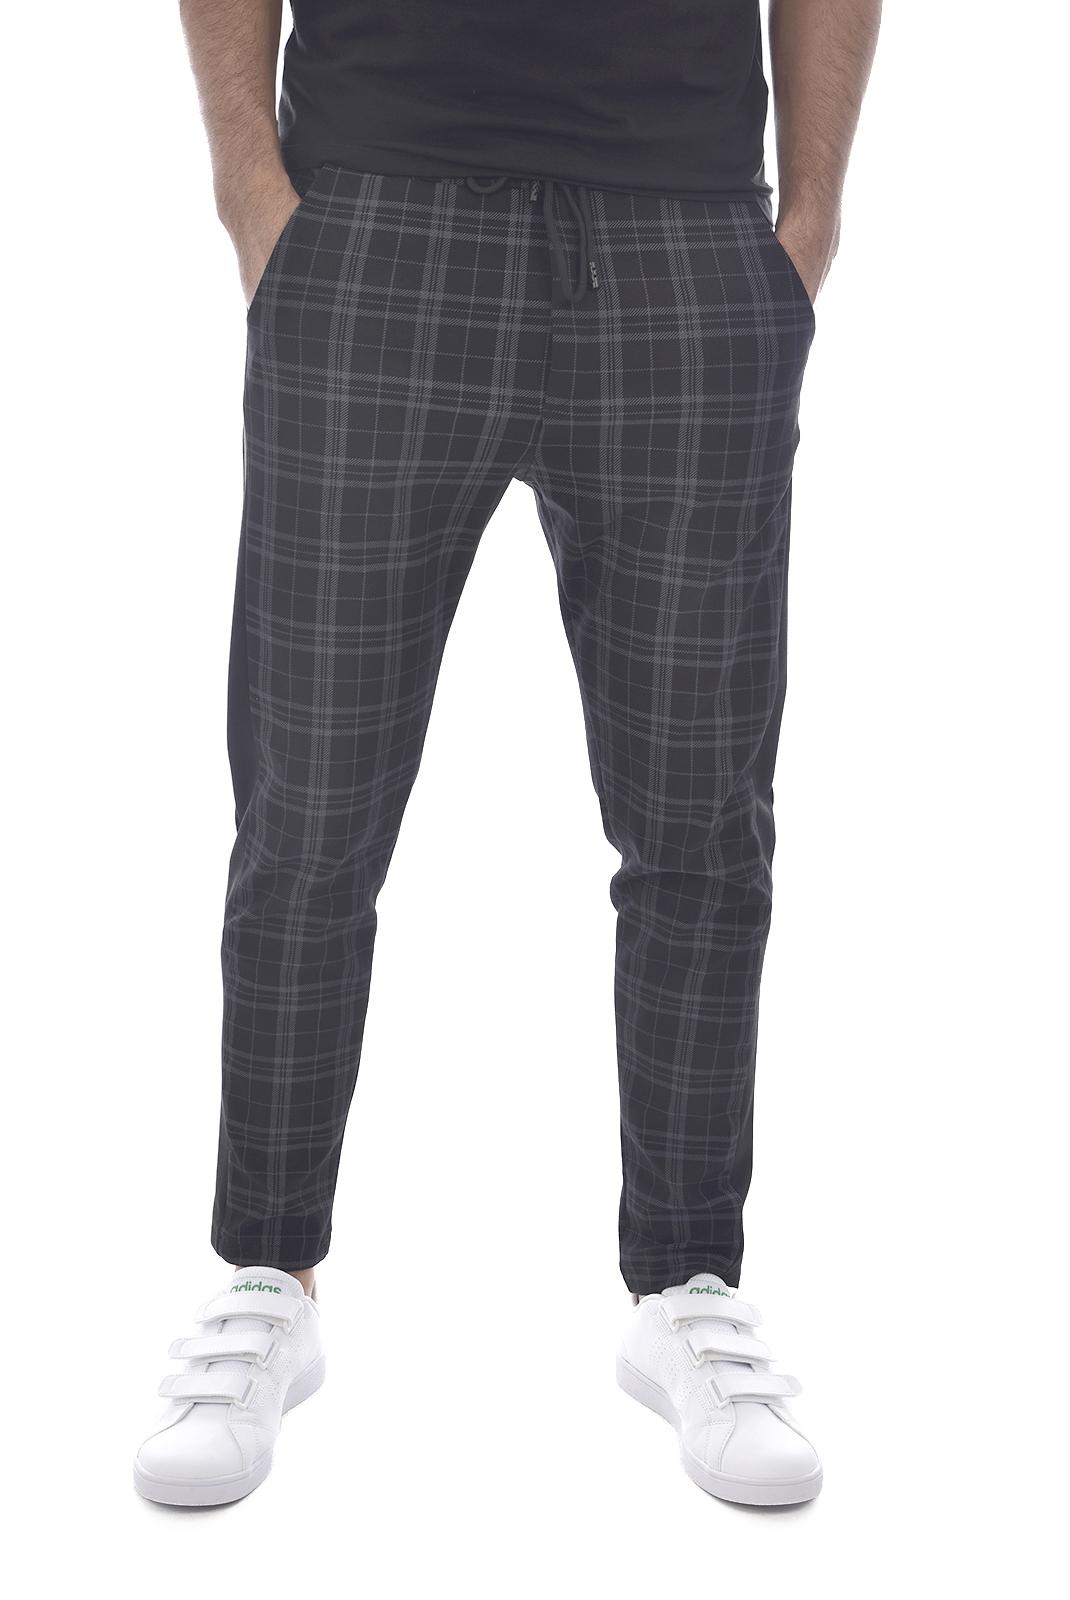 Pantalons sport/streetwear  Made in Italy TM0002.1 NOIR RAYE GRIS